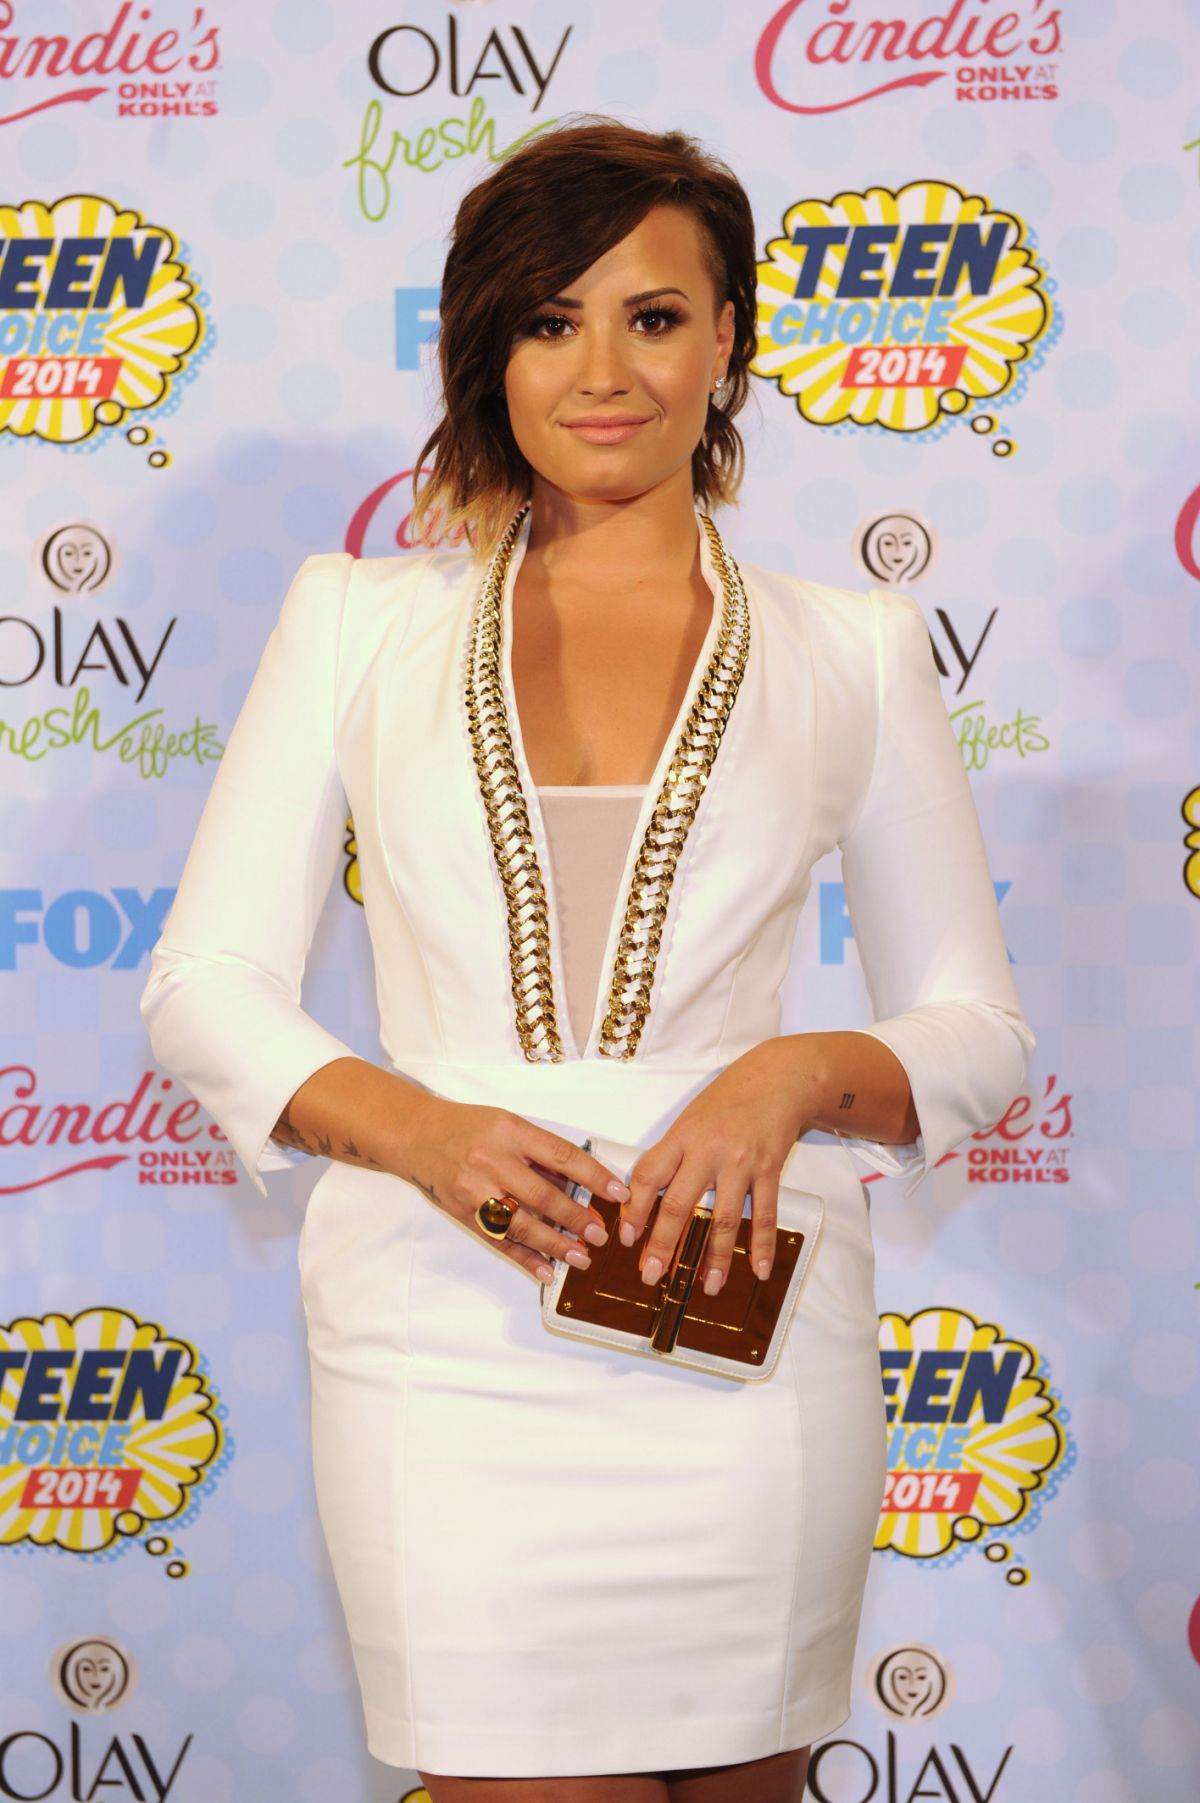 DEMI LOVATO at Teen Choice Awards 2014 in Los Angeles